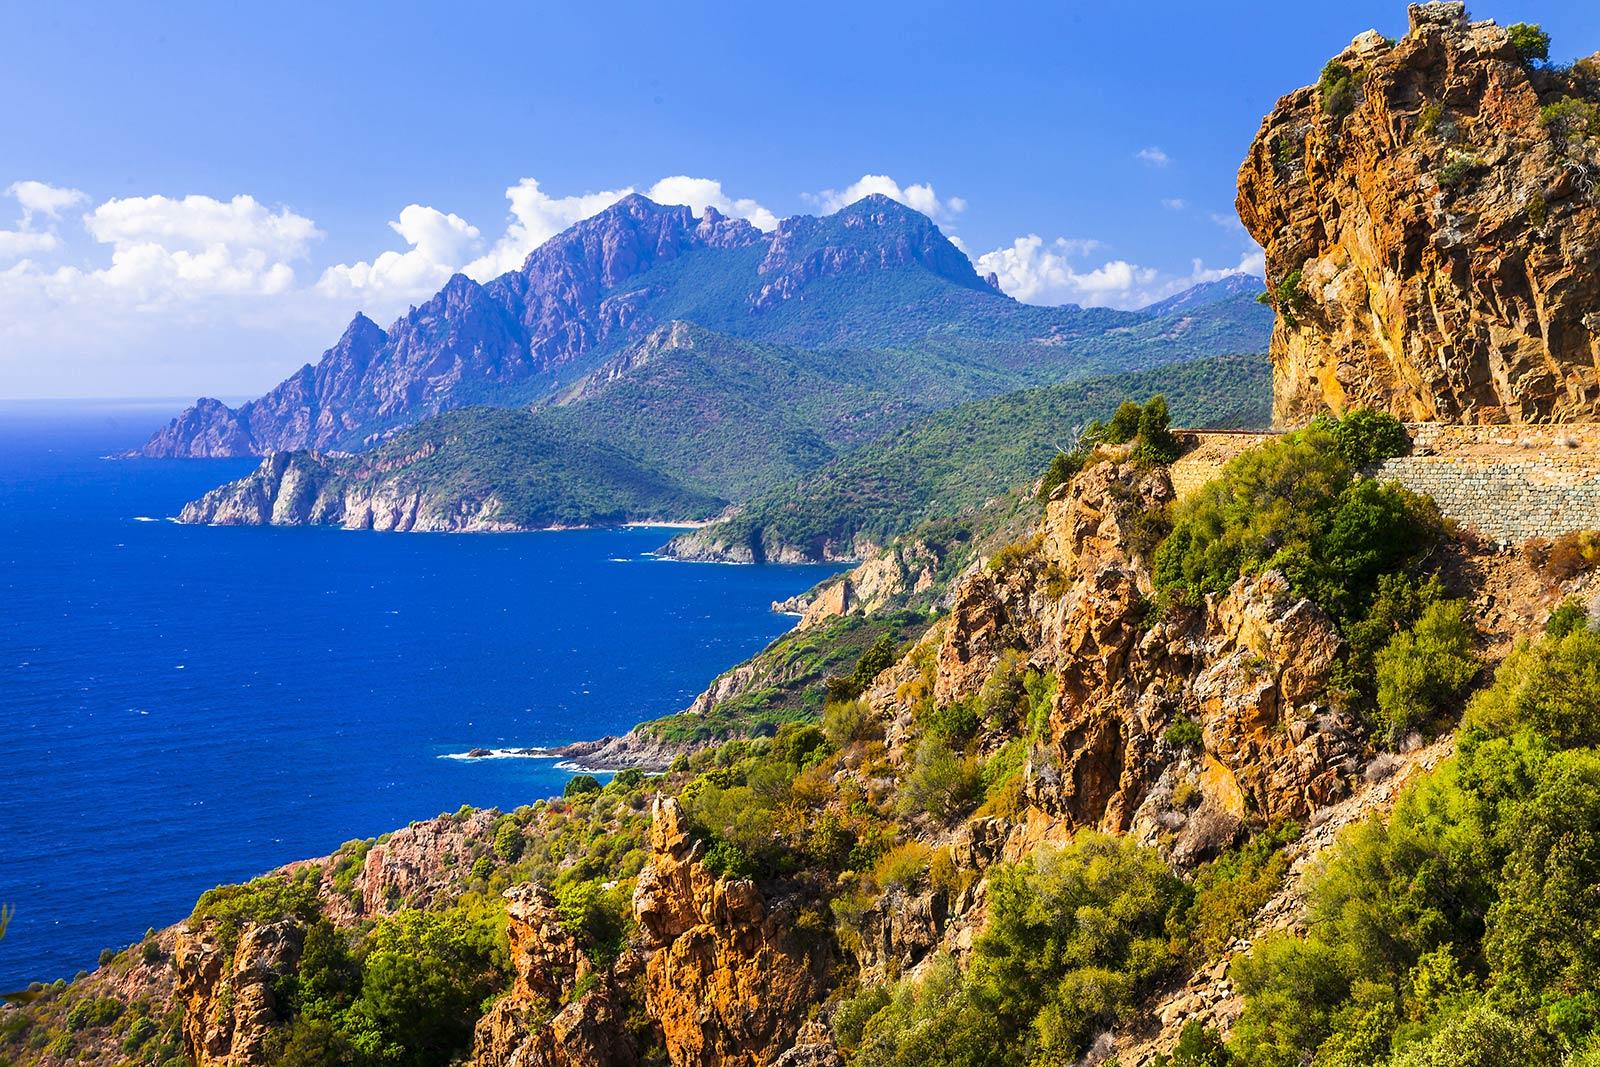 View of Corsica's coast line